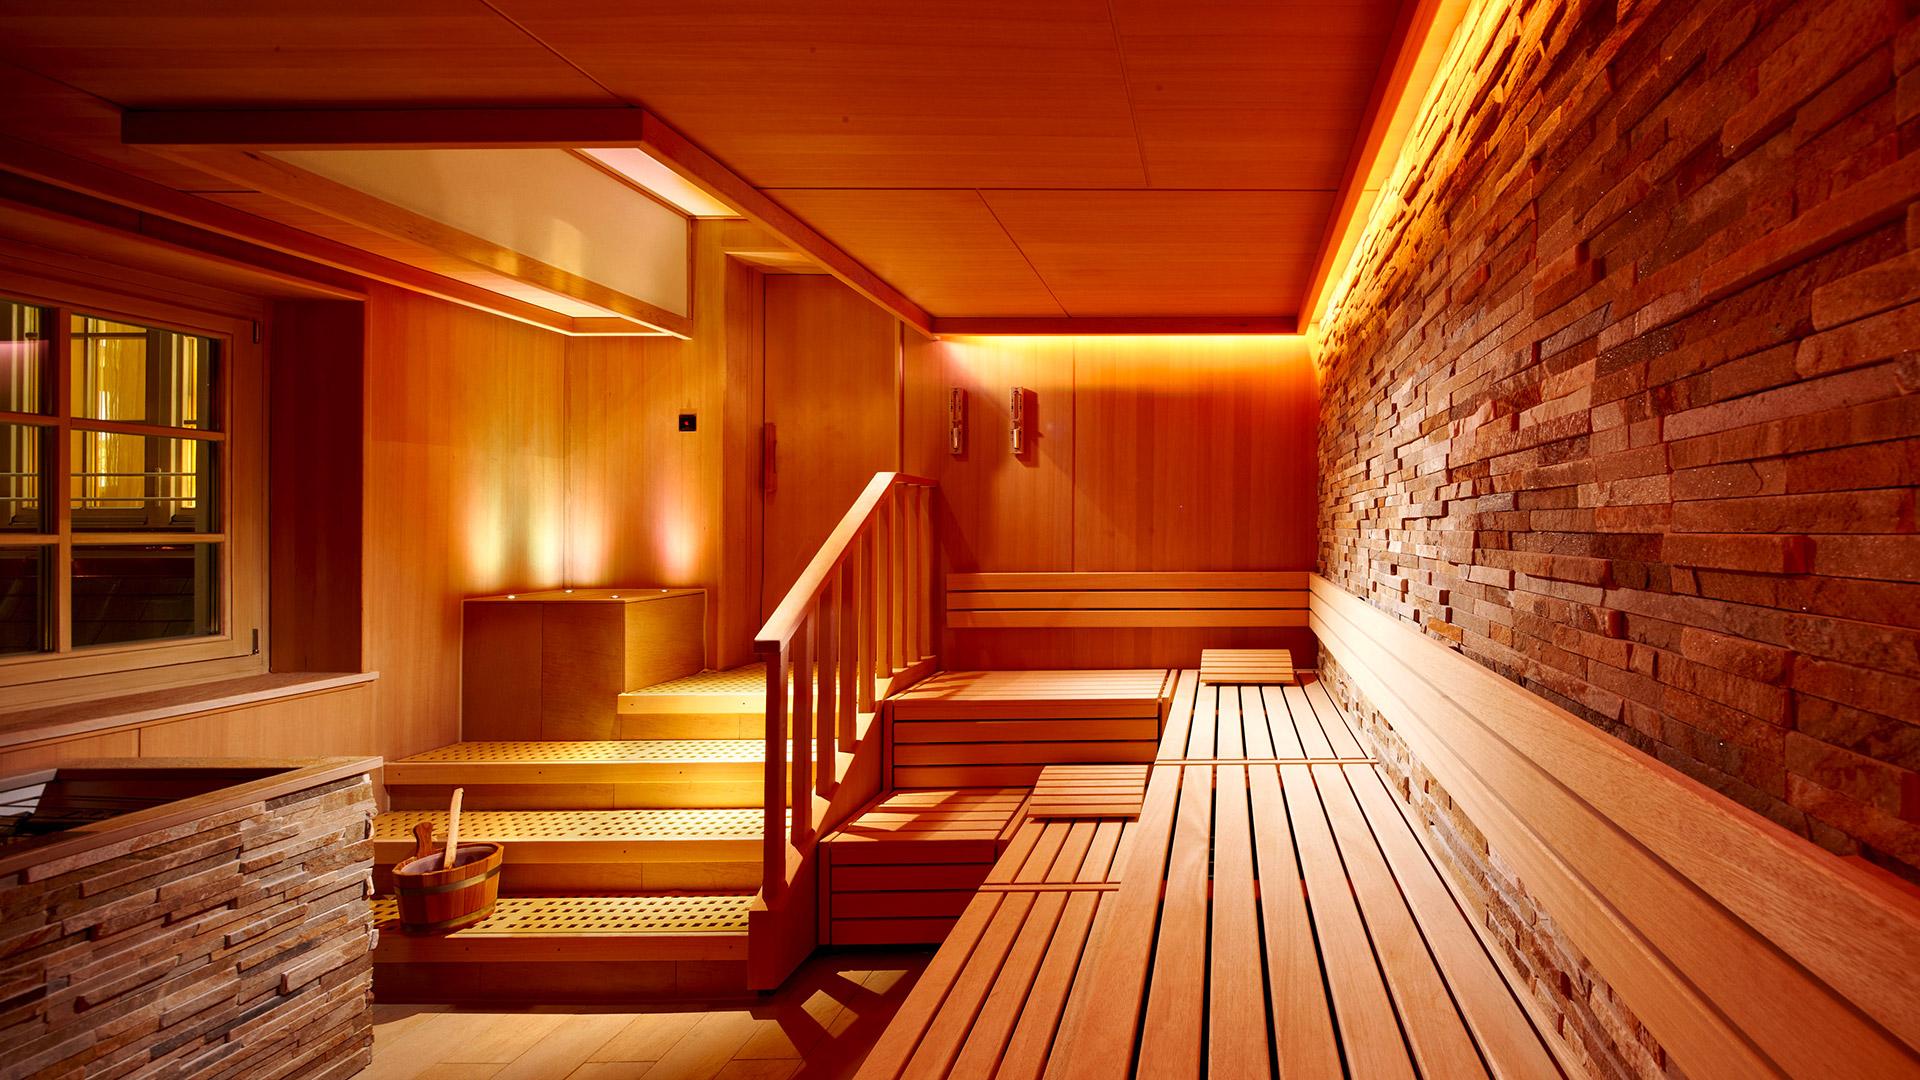 https://www.dltviaggi.it/immagine/20151/salzburgerhof-zell-am-see_sauna.jpg